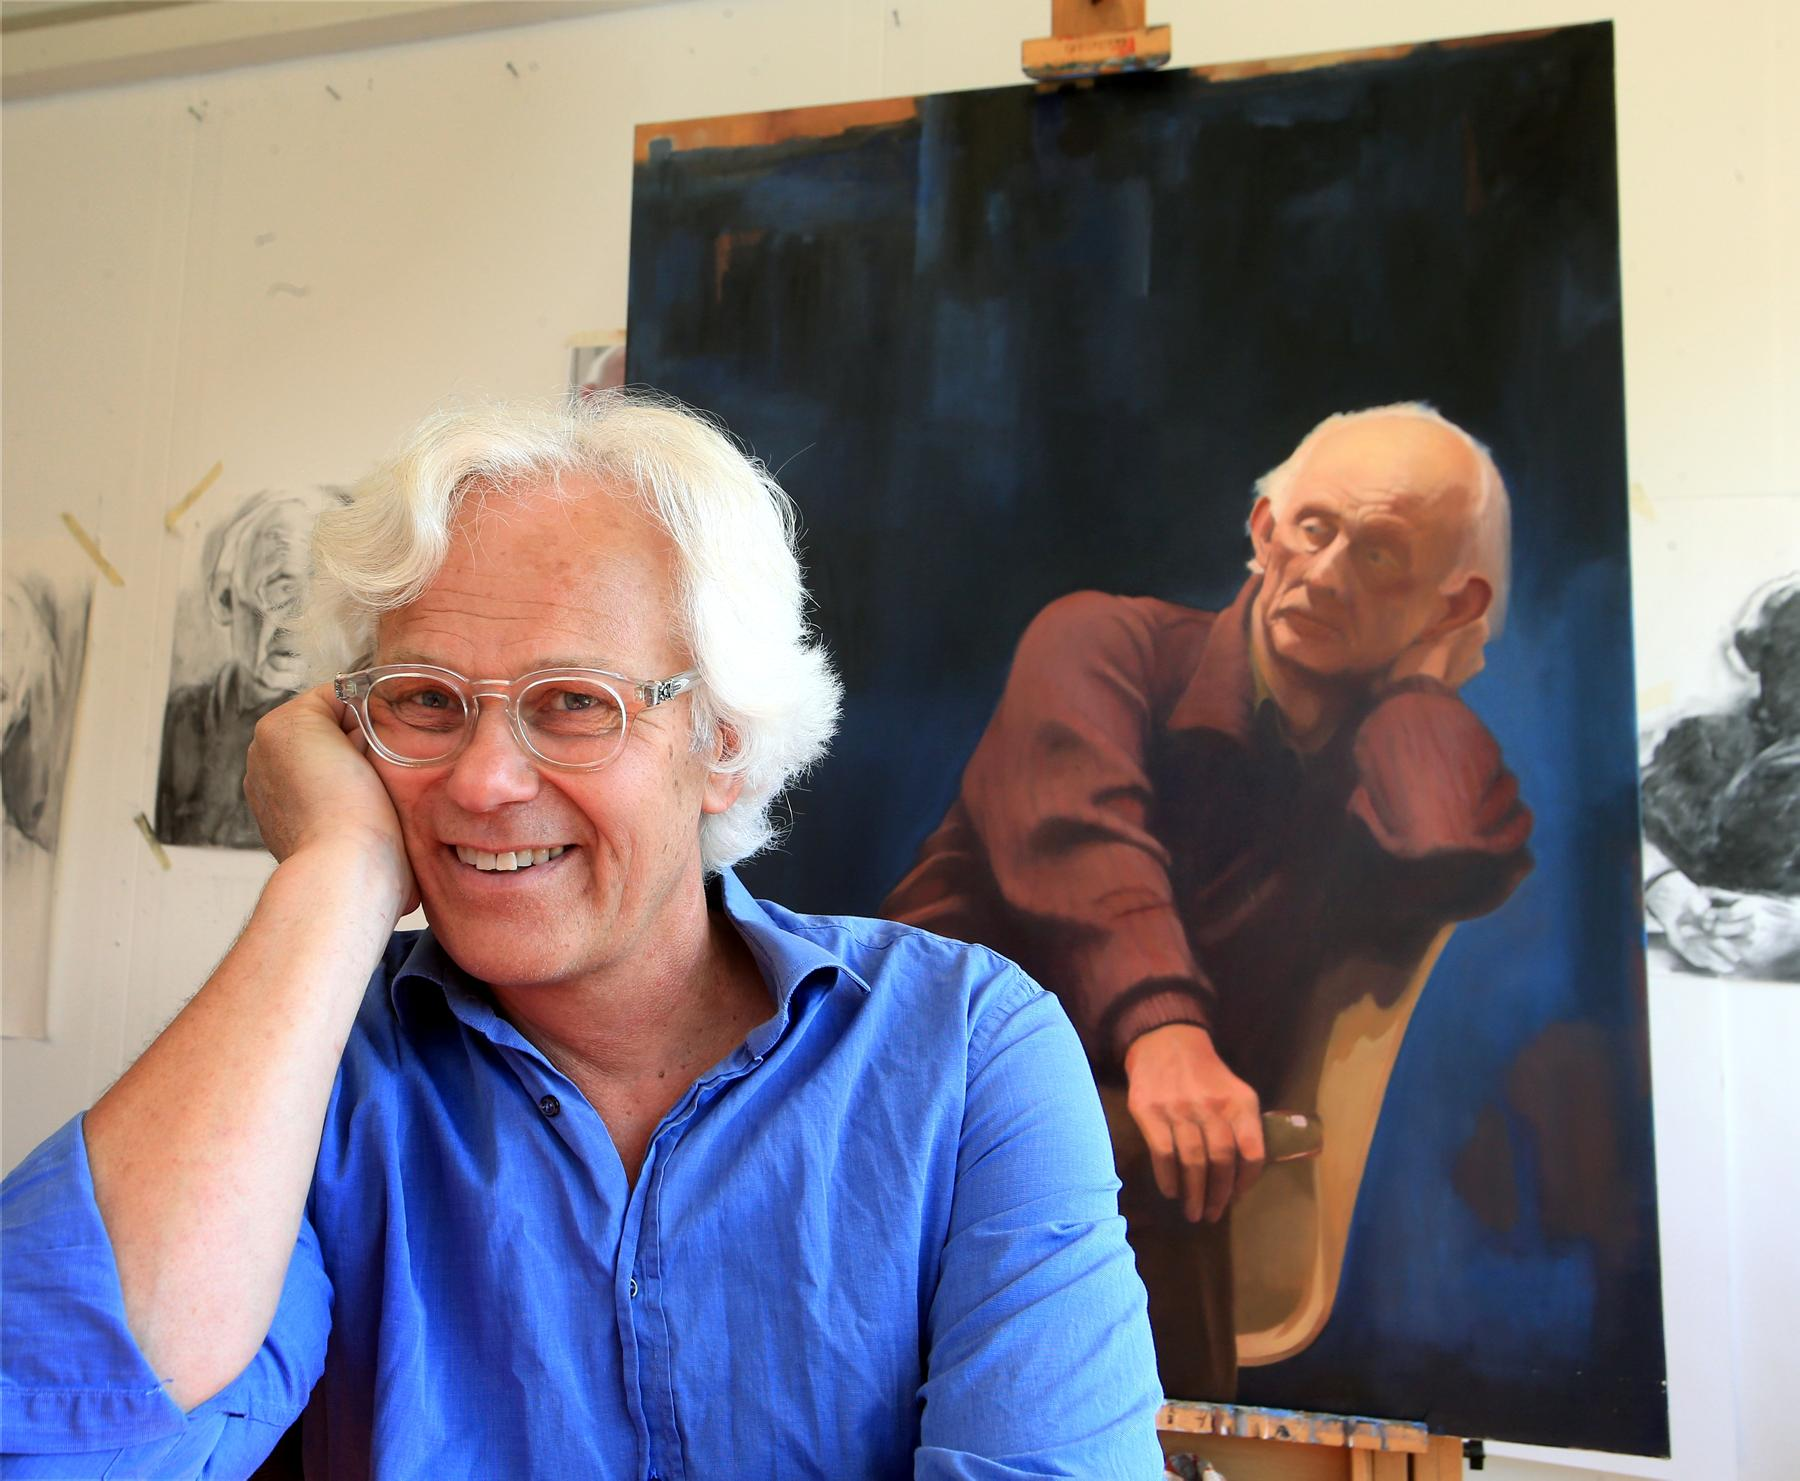 Kunstner Pål Gulsrud